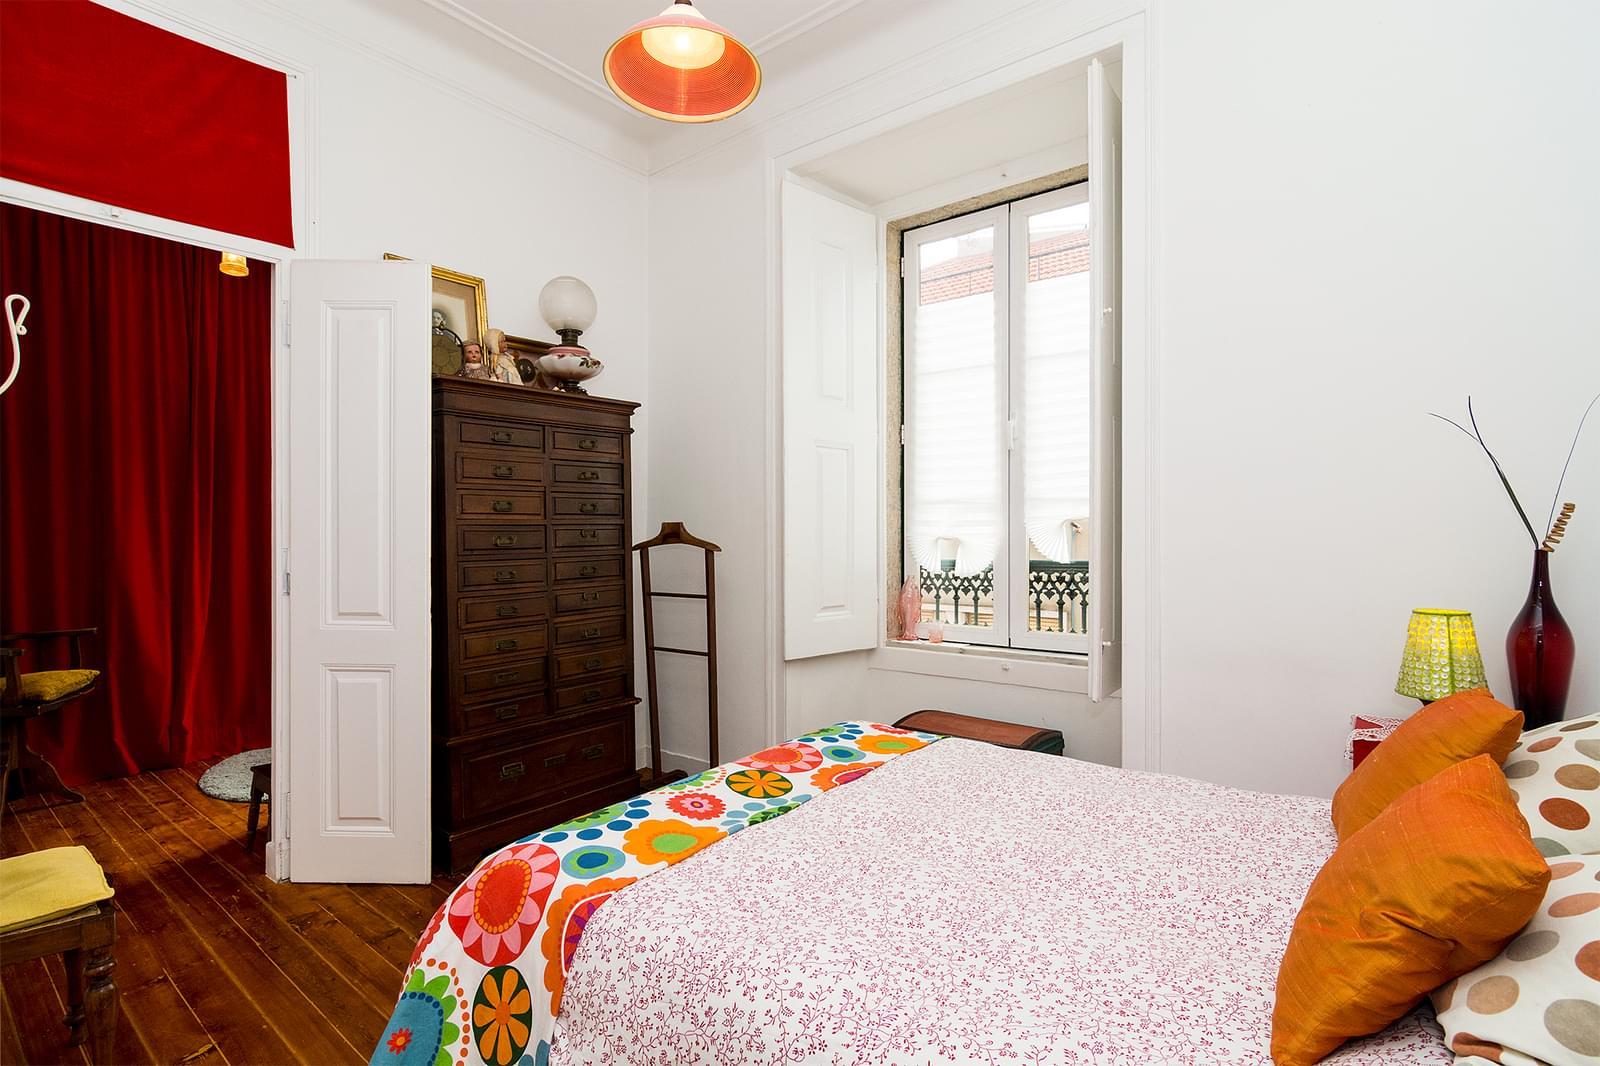 pf17497-apartamento-t3-lisboa-ff57e72b-5612-4ad4-84b1-42fcdc2b6c34